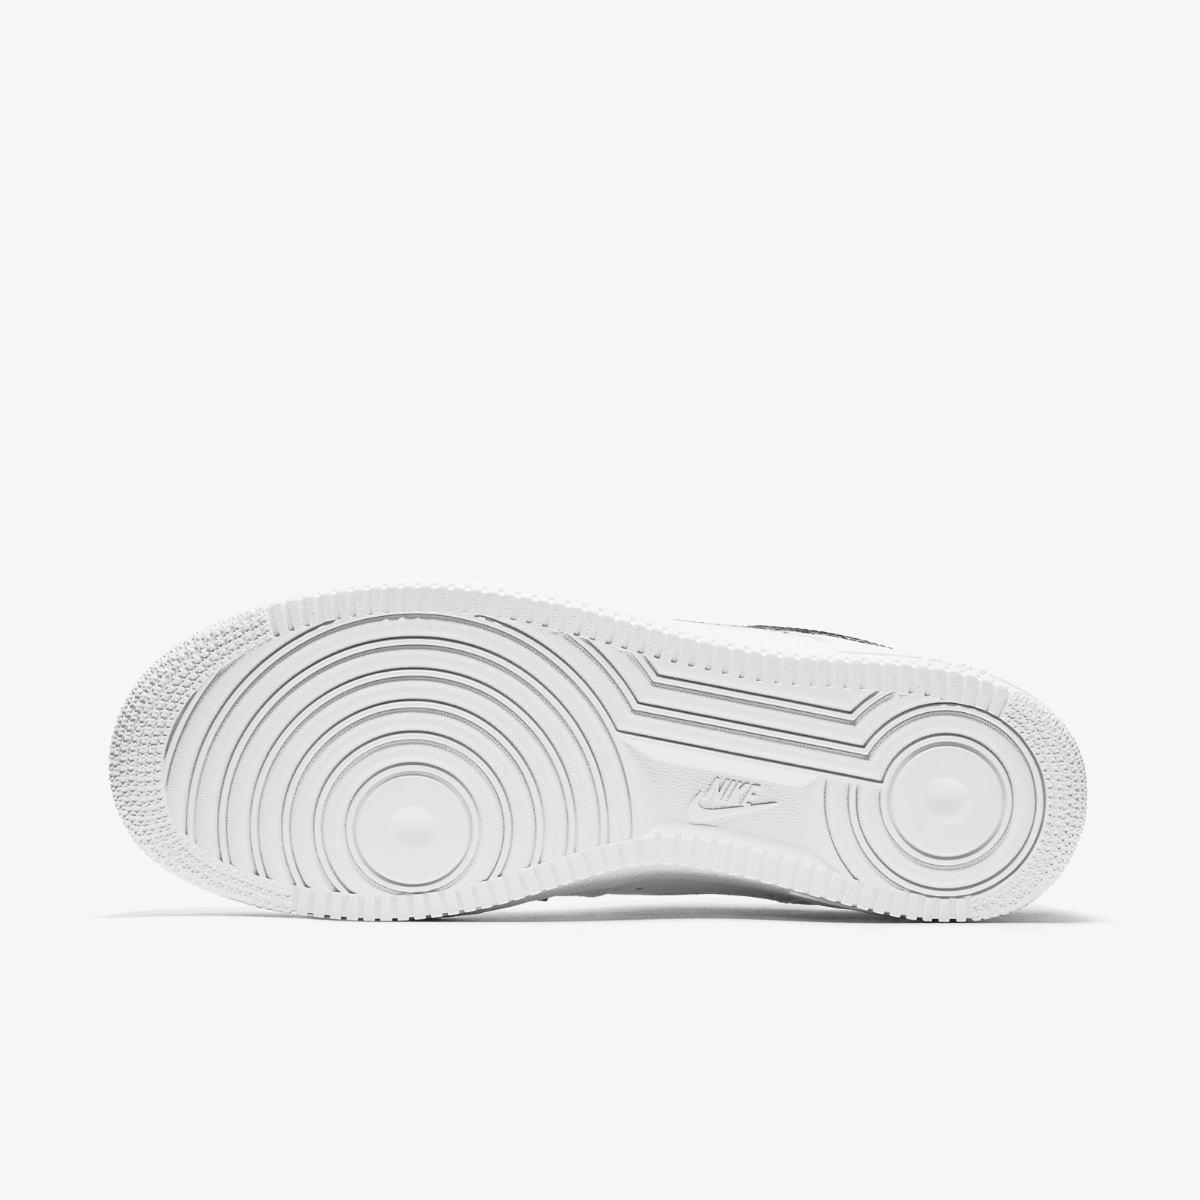 2fece8ce Кроссовки Nike AIR FORCE 1 07 PRM JDI AR7719-100 купить | deltasport.ua